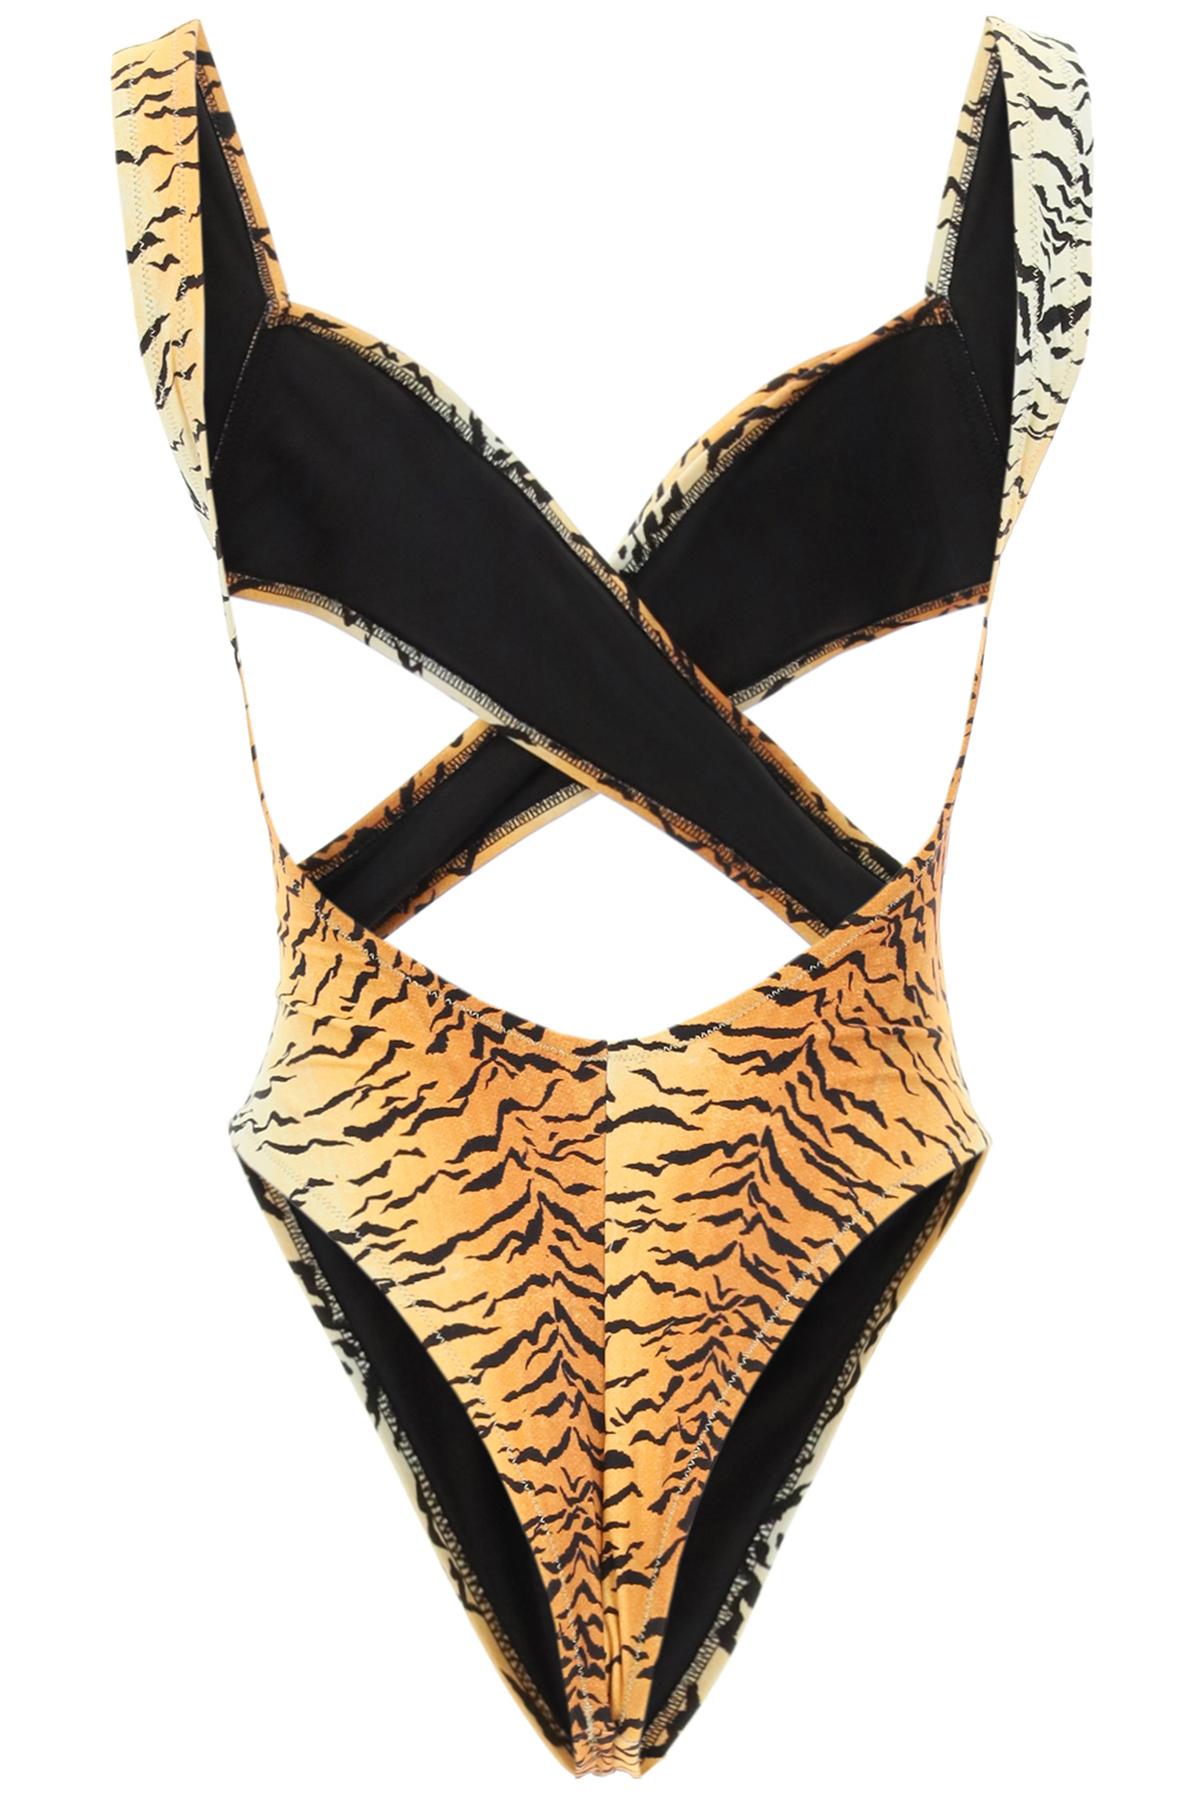 Reina olga costume intero exotica stampa tigre